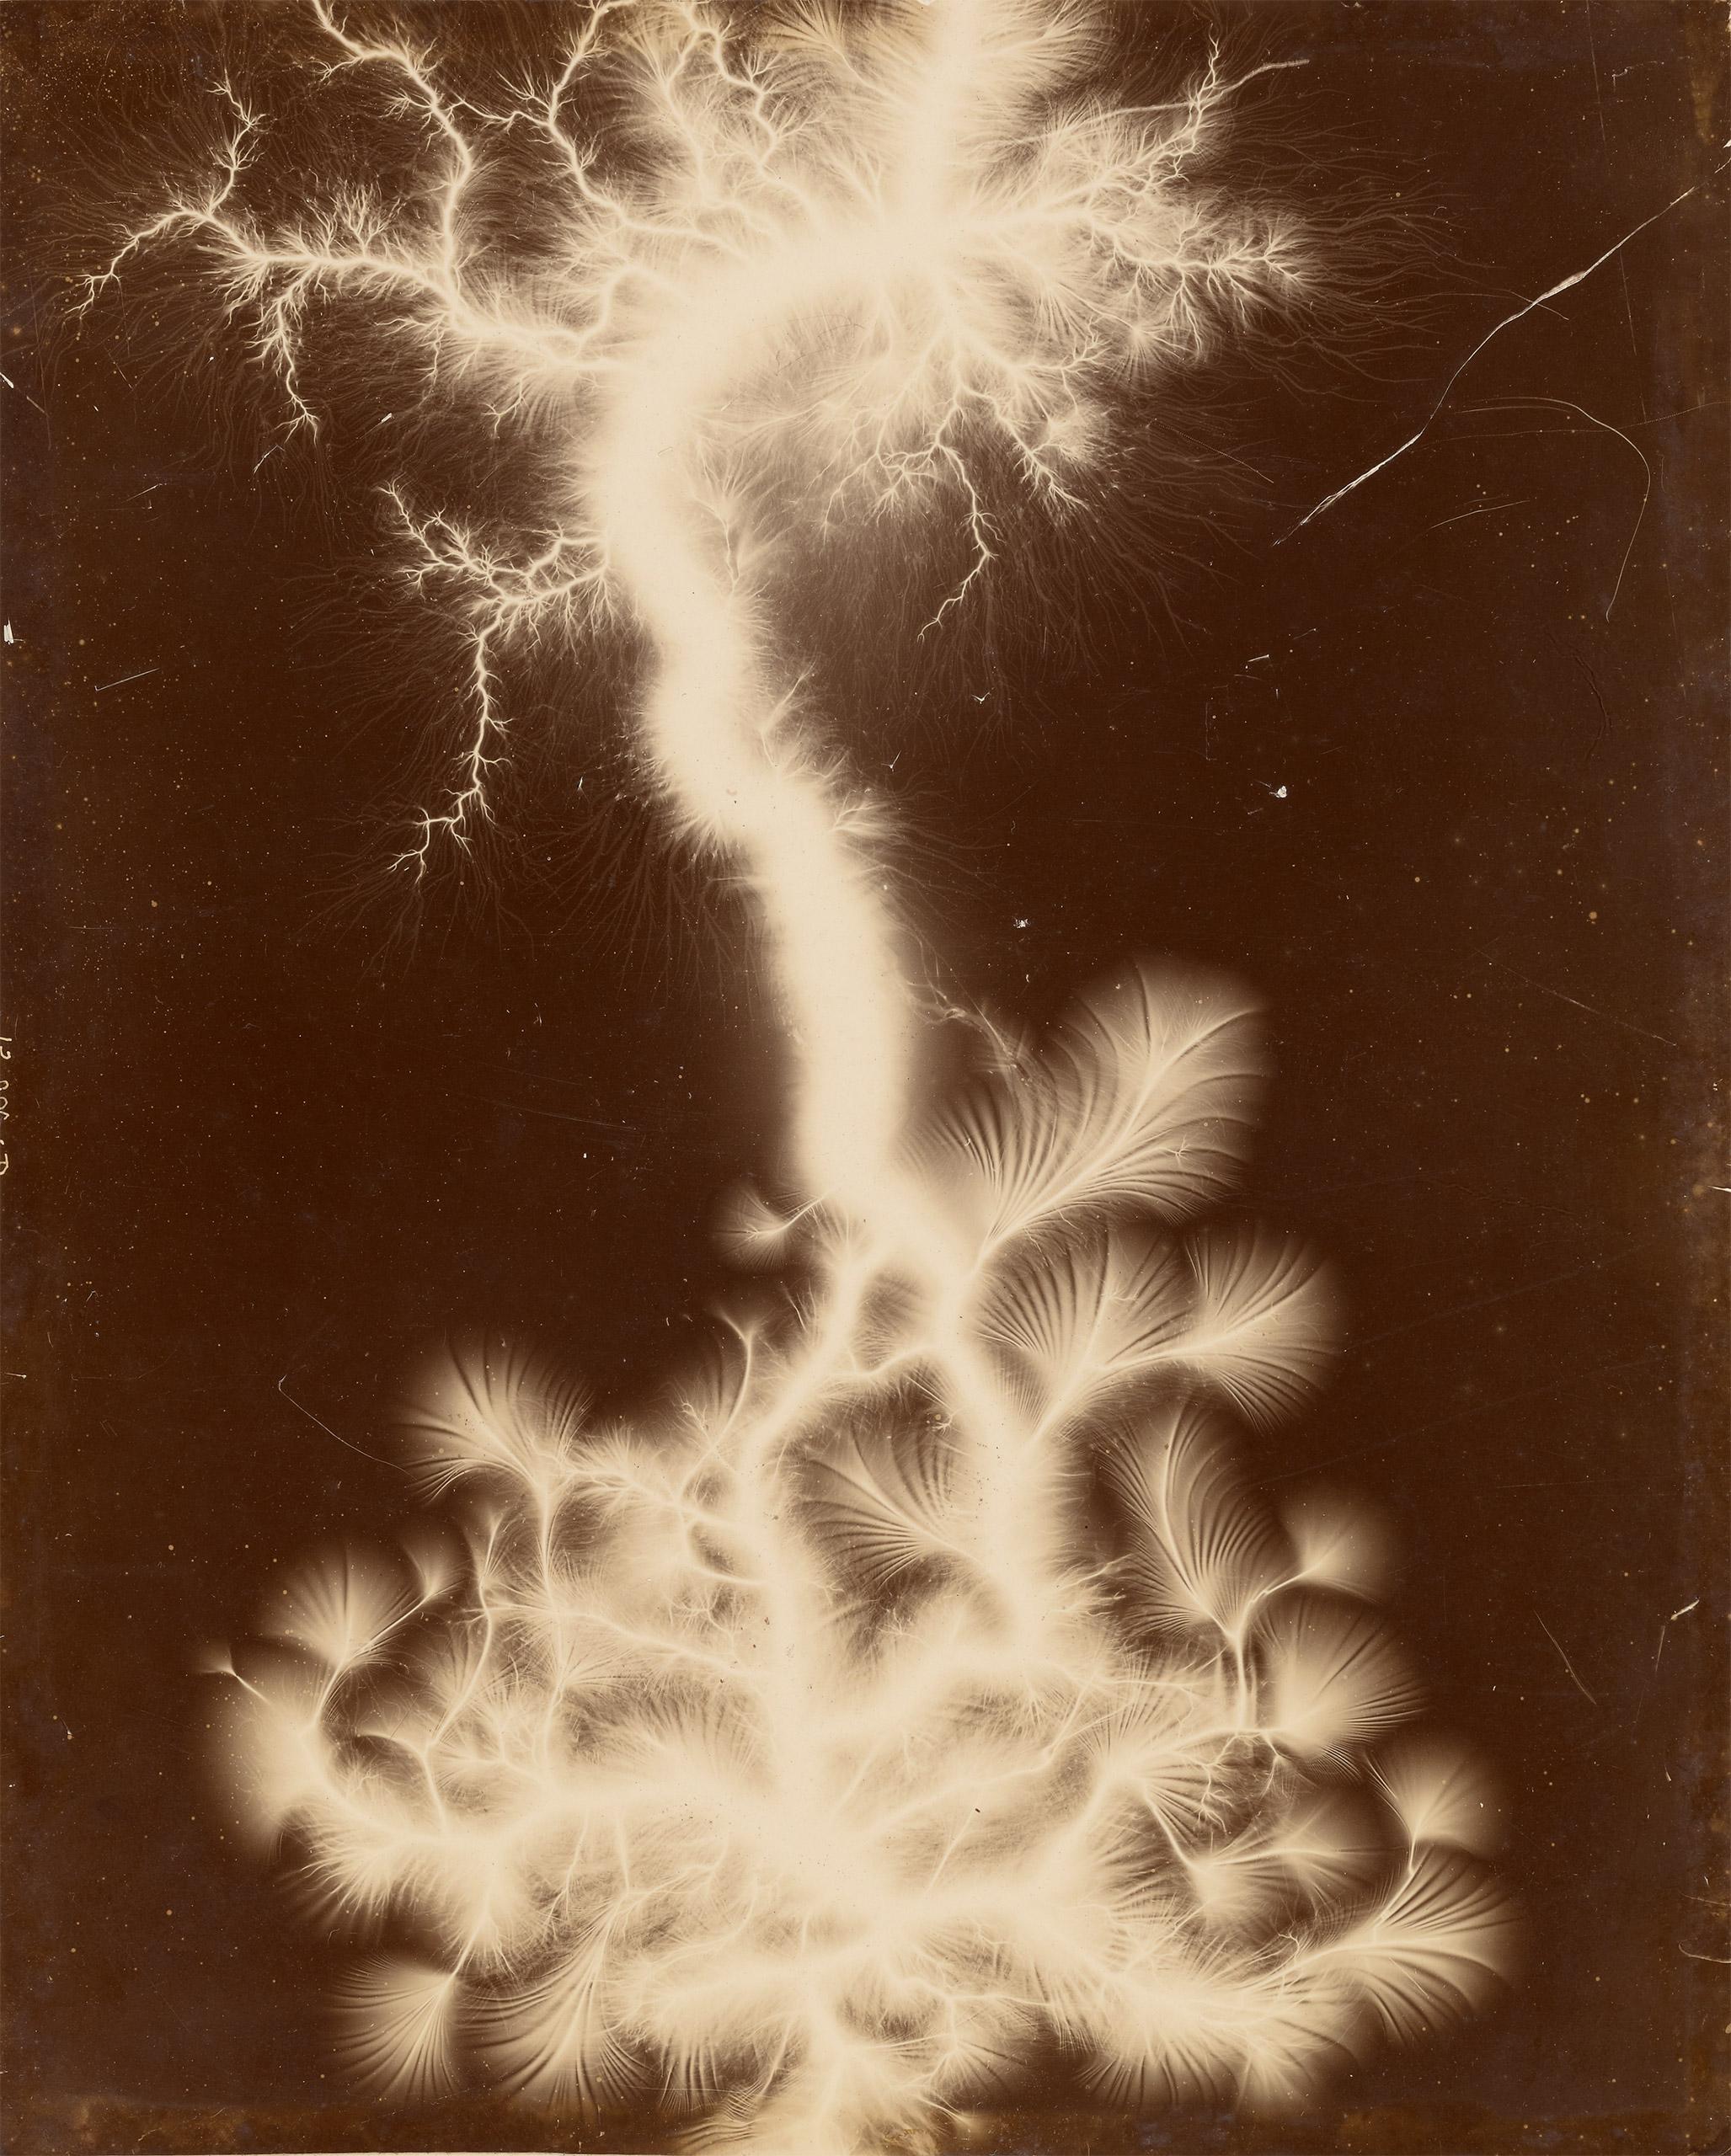 [Miniature Lightning Show], 1895The J. Paul Getty Museum, Los Angeles